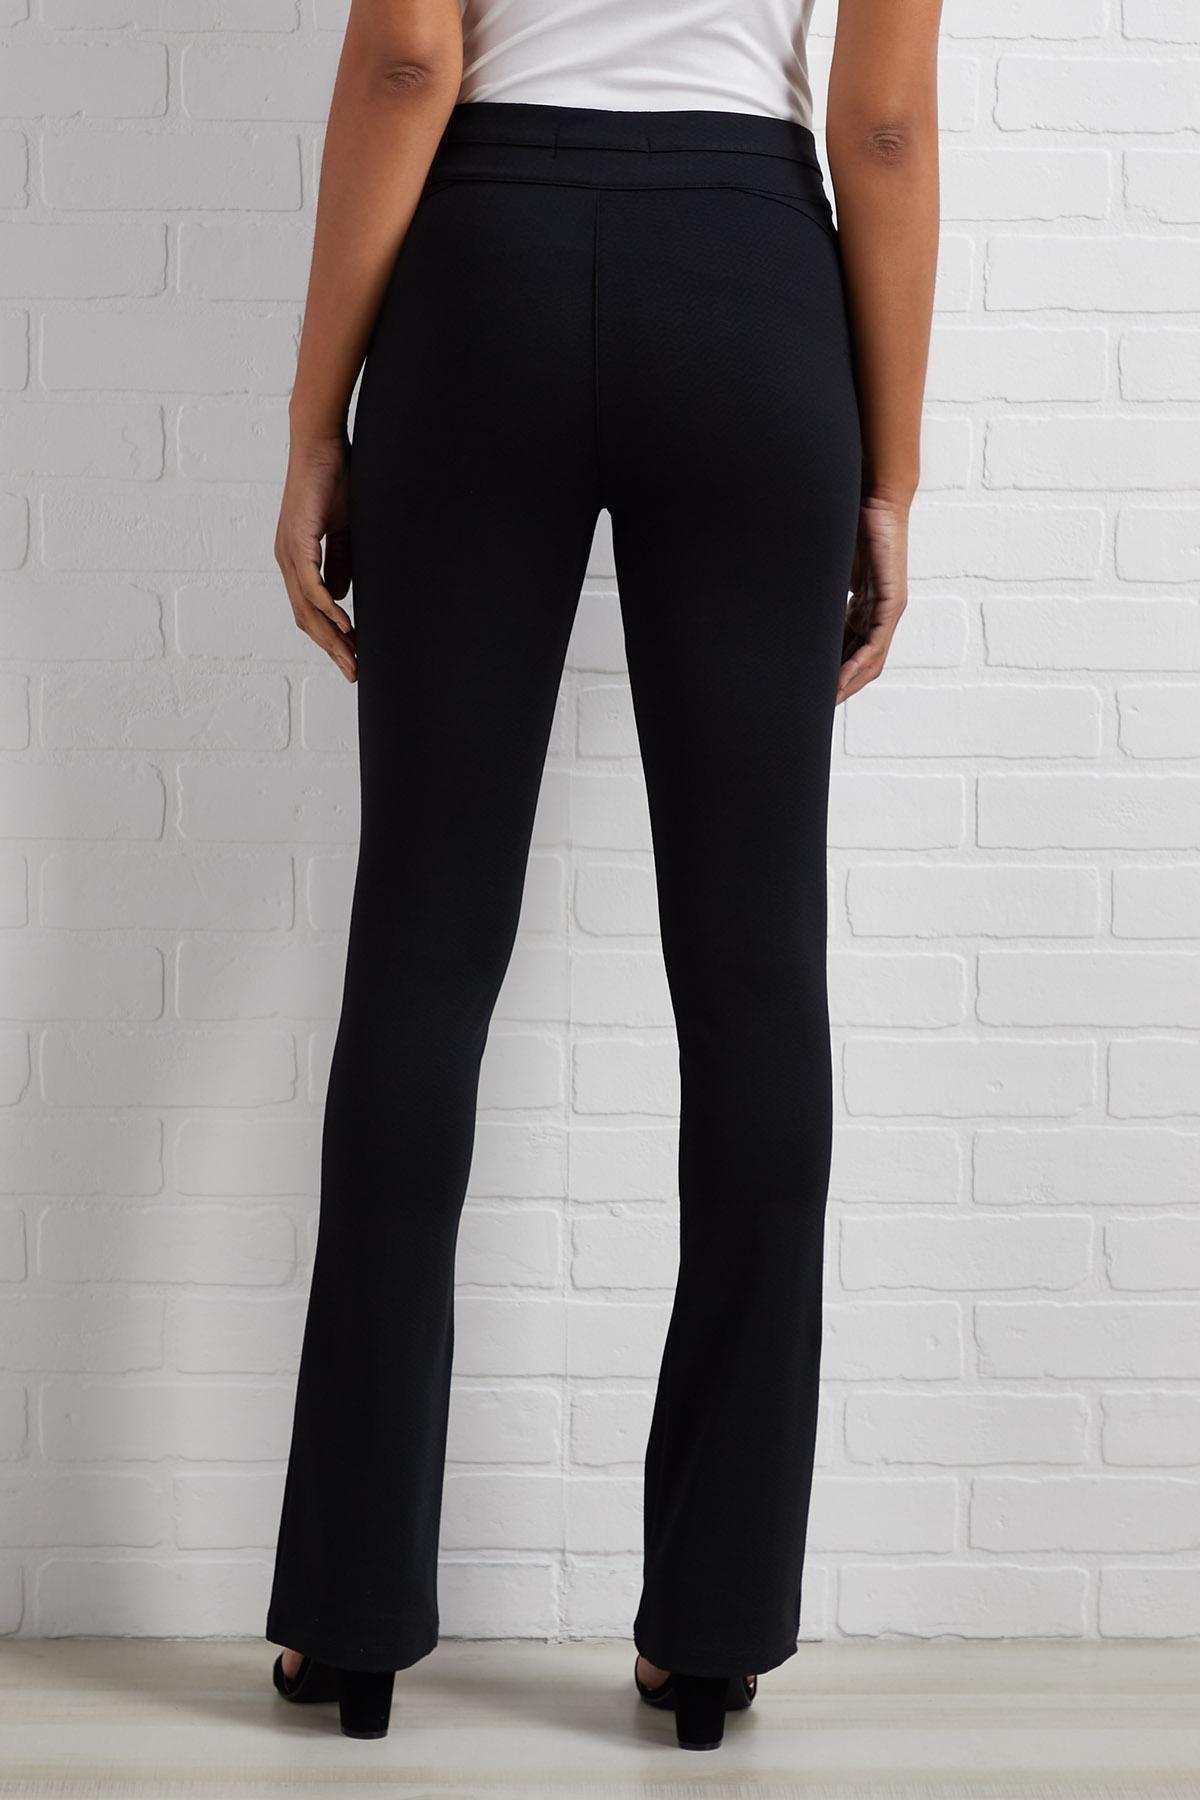 Ponte Blank Perfect Pants